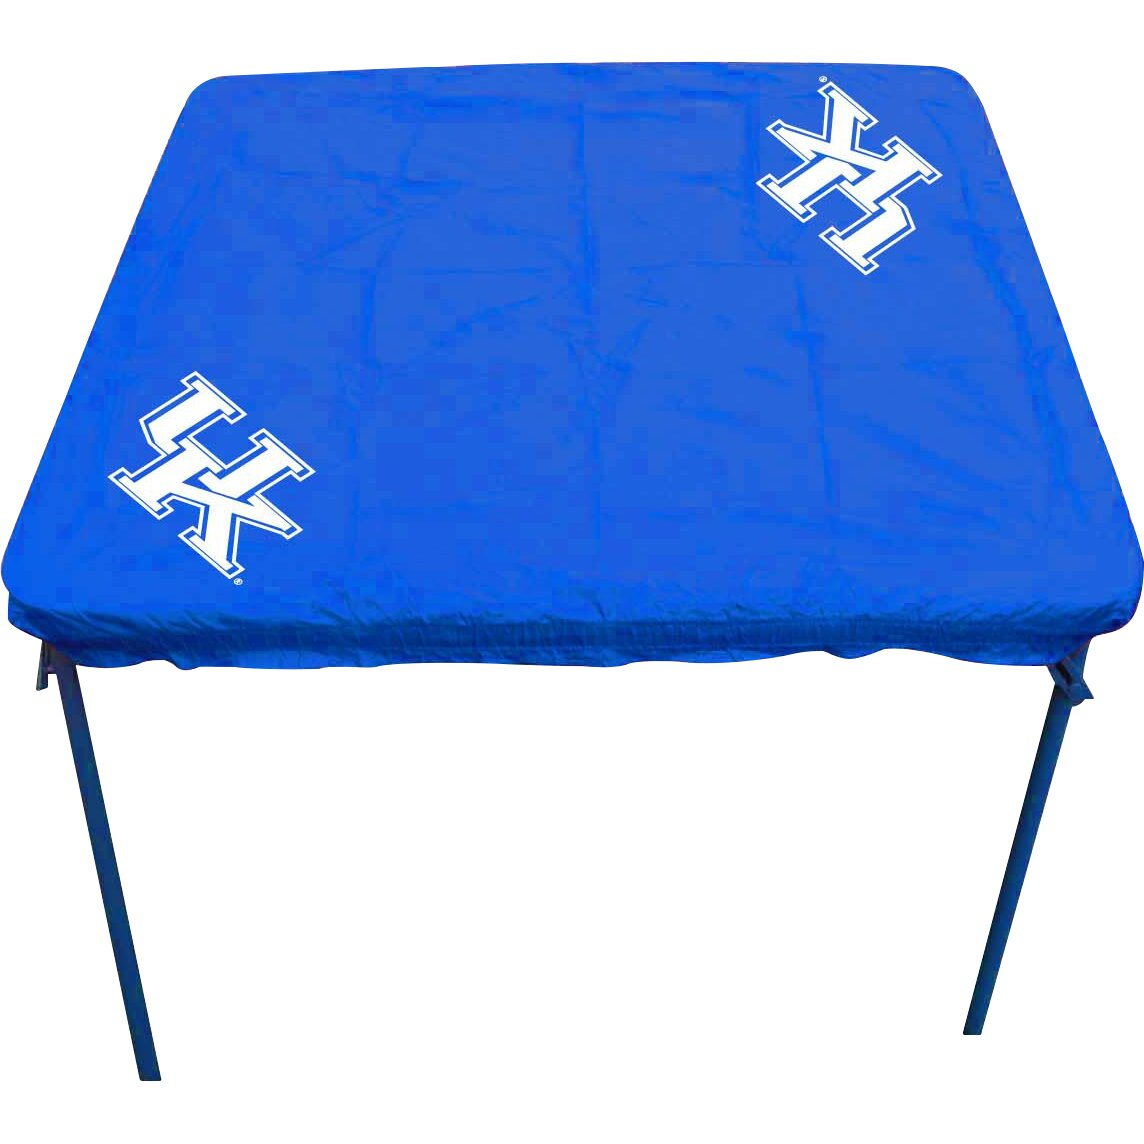 Gel Tech Mattress Outdoor Patio Furniture ... Table Patio Furniture Covers Rivalry SKU ...